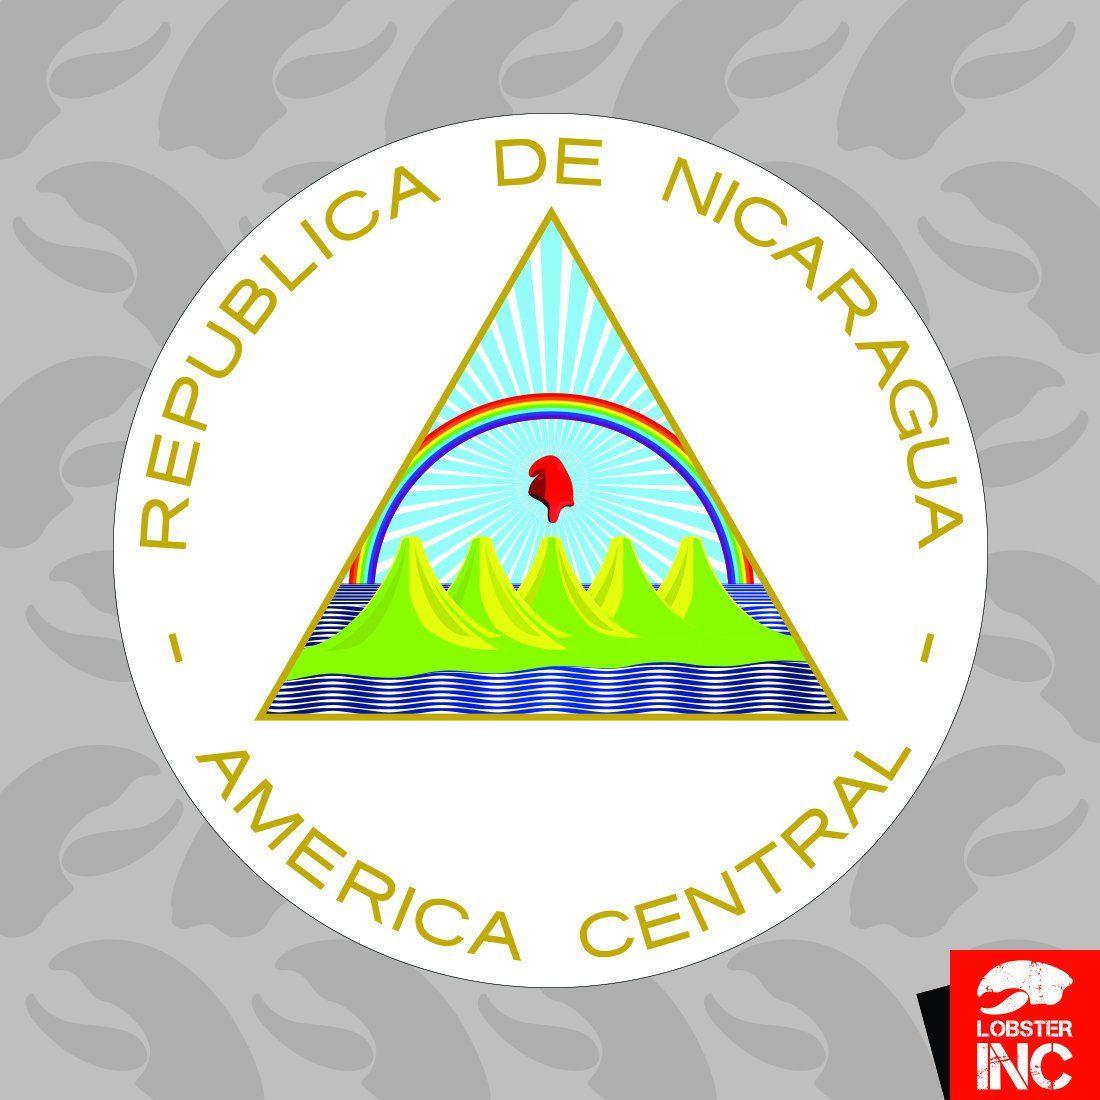 Nica Nicaragua Central America Pinolero Decal Vinyl Bumper Sticker 5